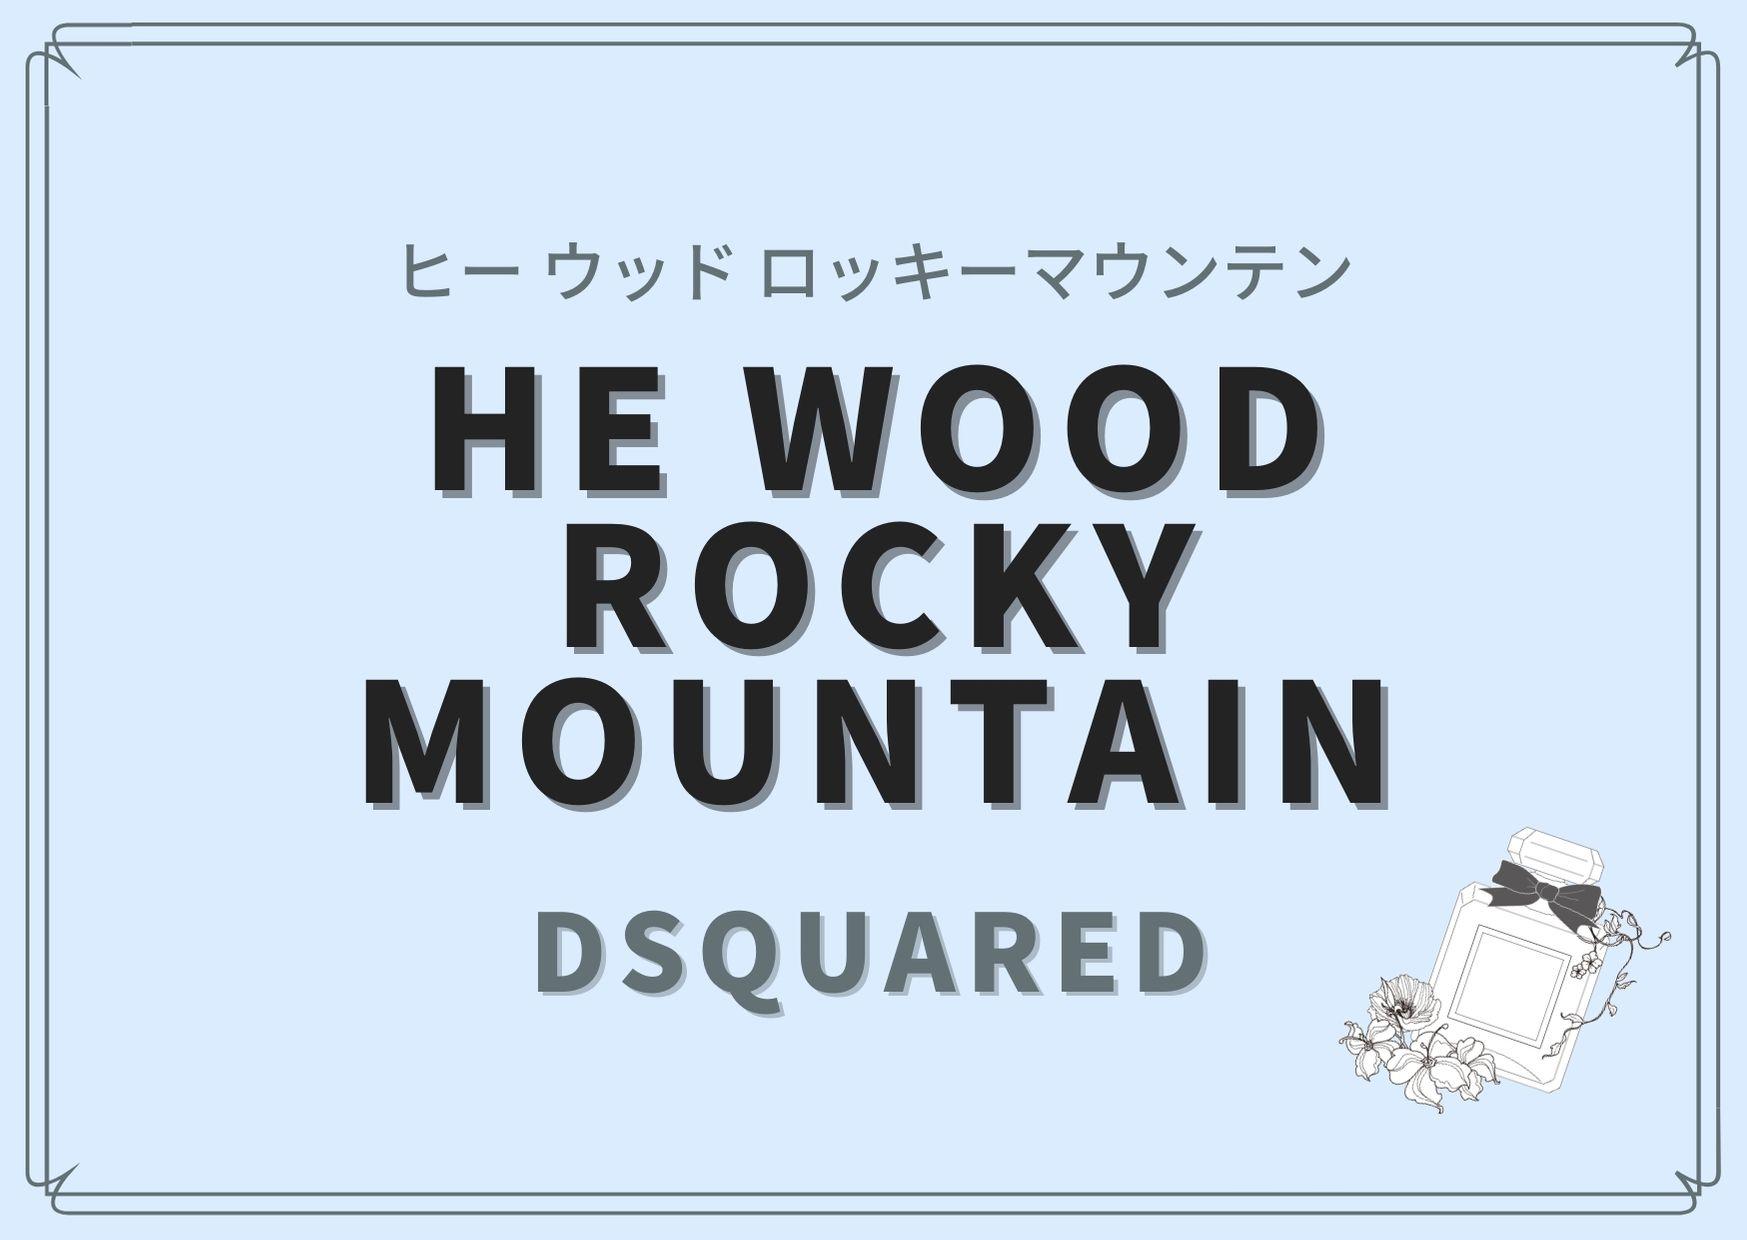 HE WOOD ROCKY MOUNTAIN(ヒー ウッド ロッキーマウンテン)/DSQUARED(ディースクエアード)